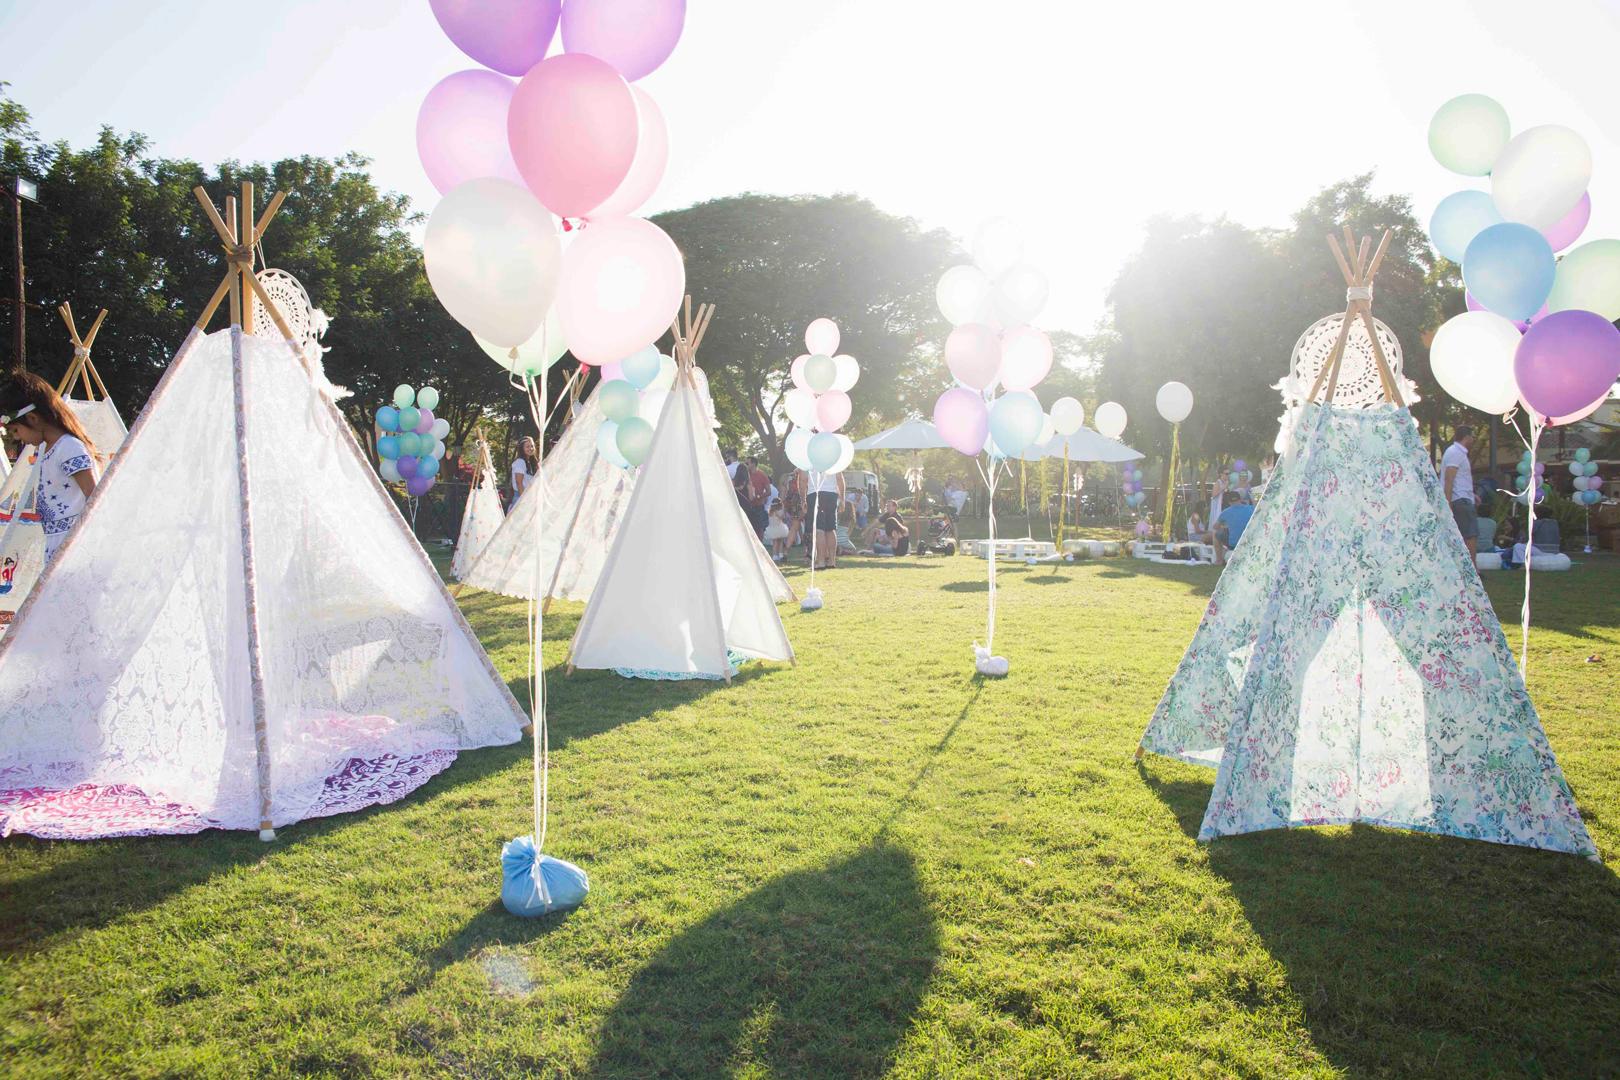 Children's Party Inspiration: 'Threechella'